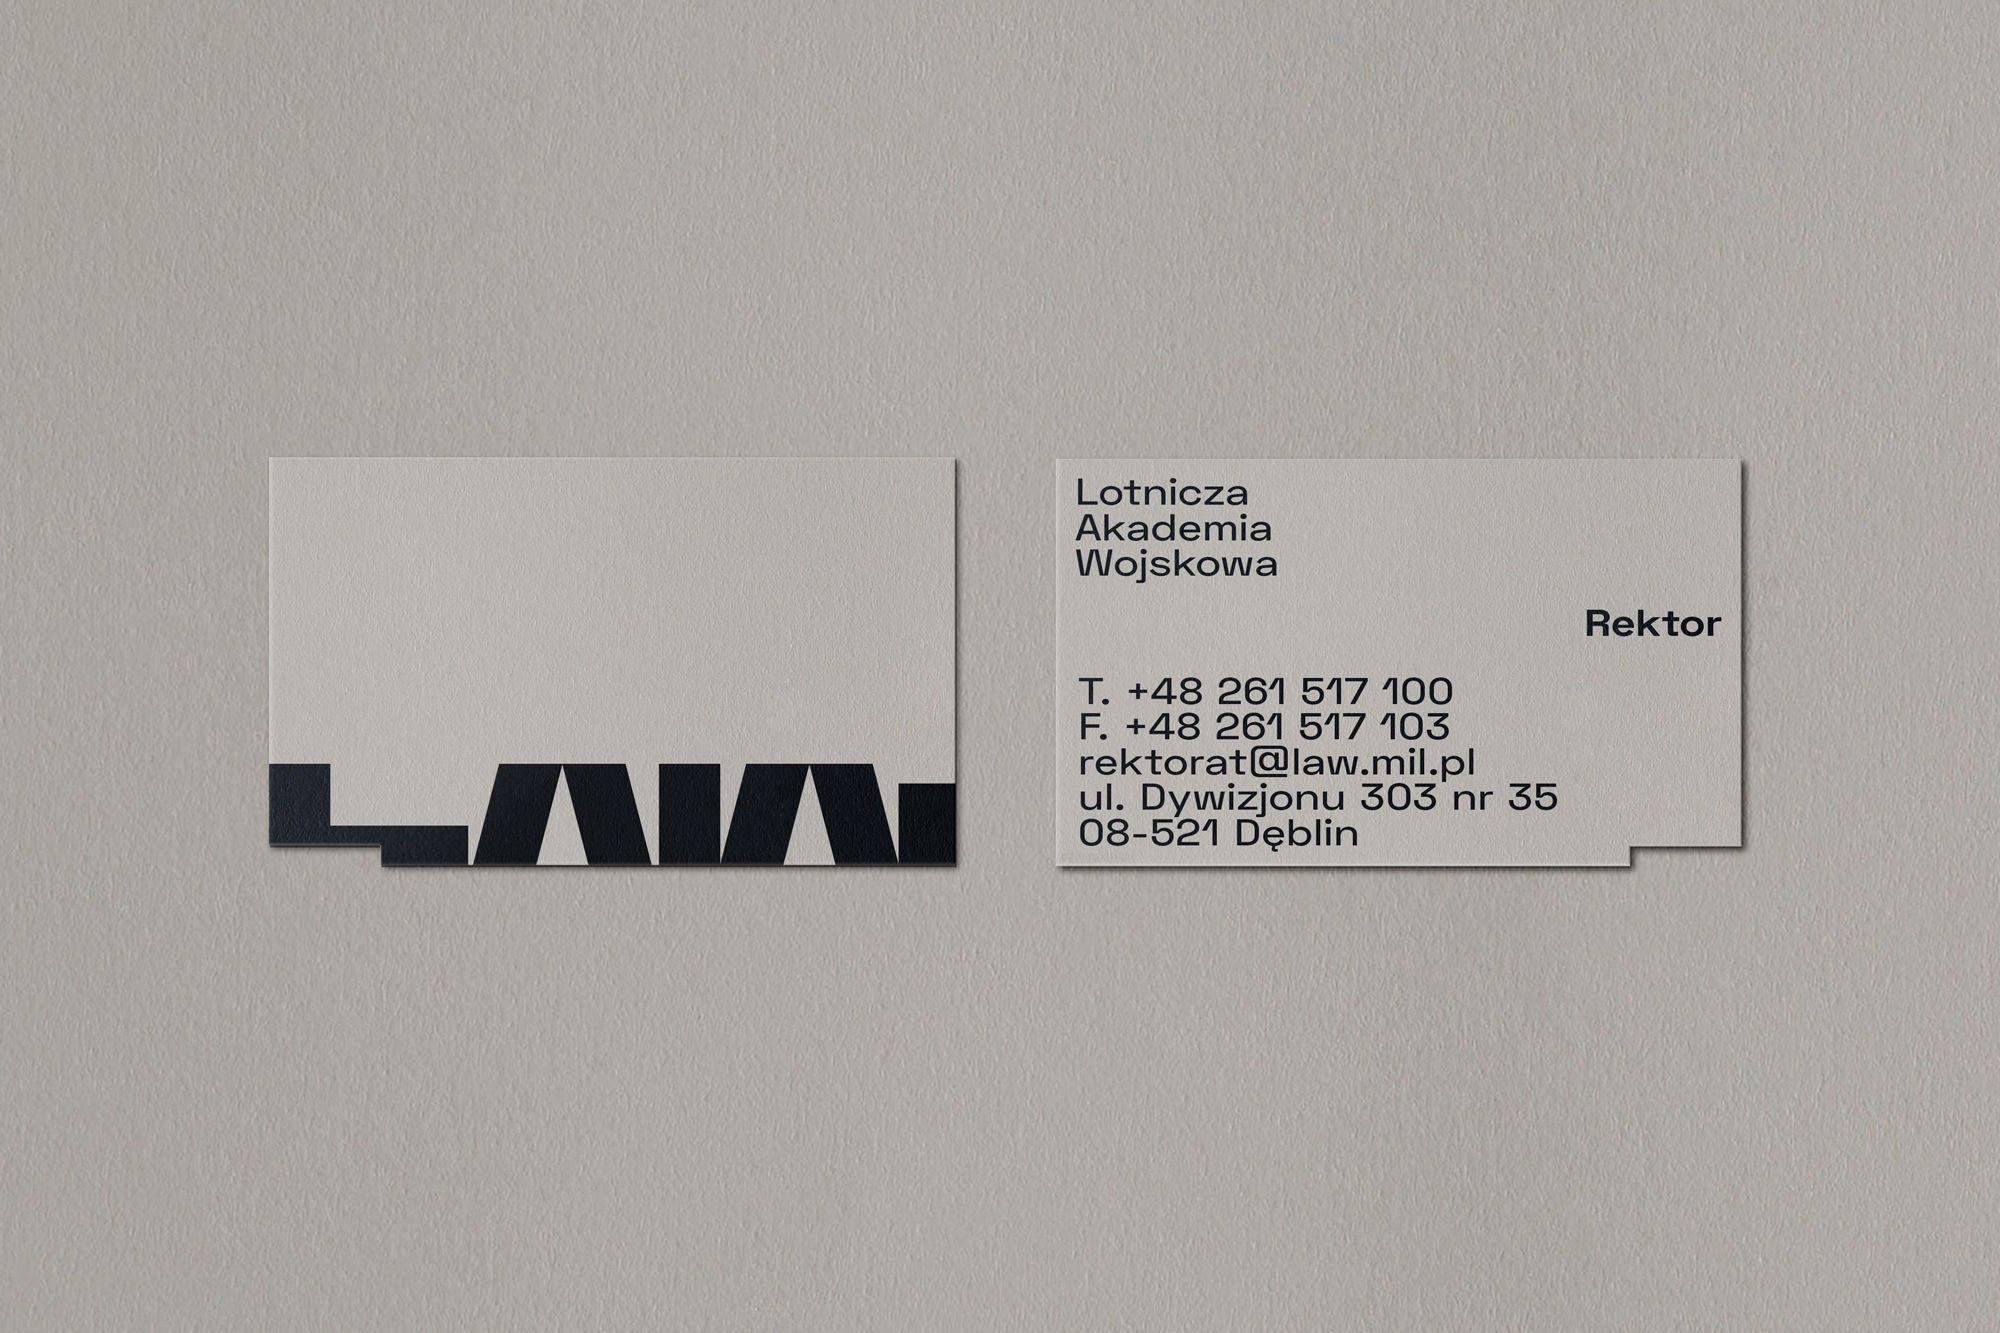 Polish Air Force University Branding On Behance Name Card Design Elegant Business Cards Design Business Card Design